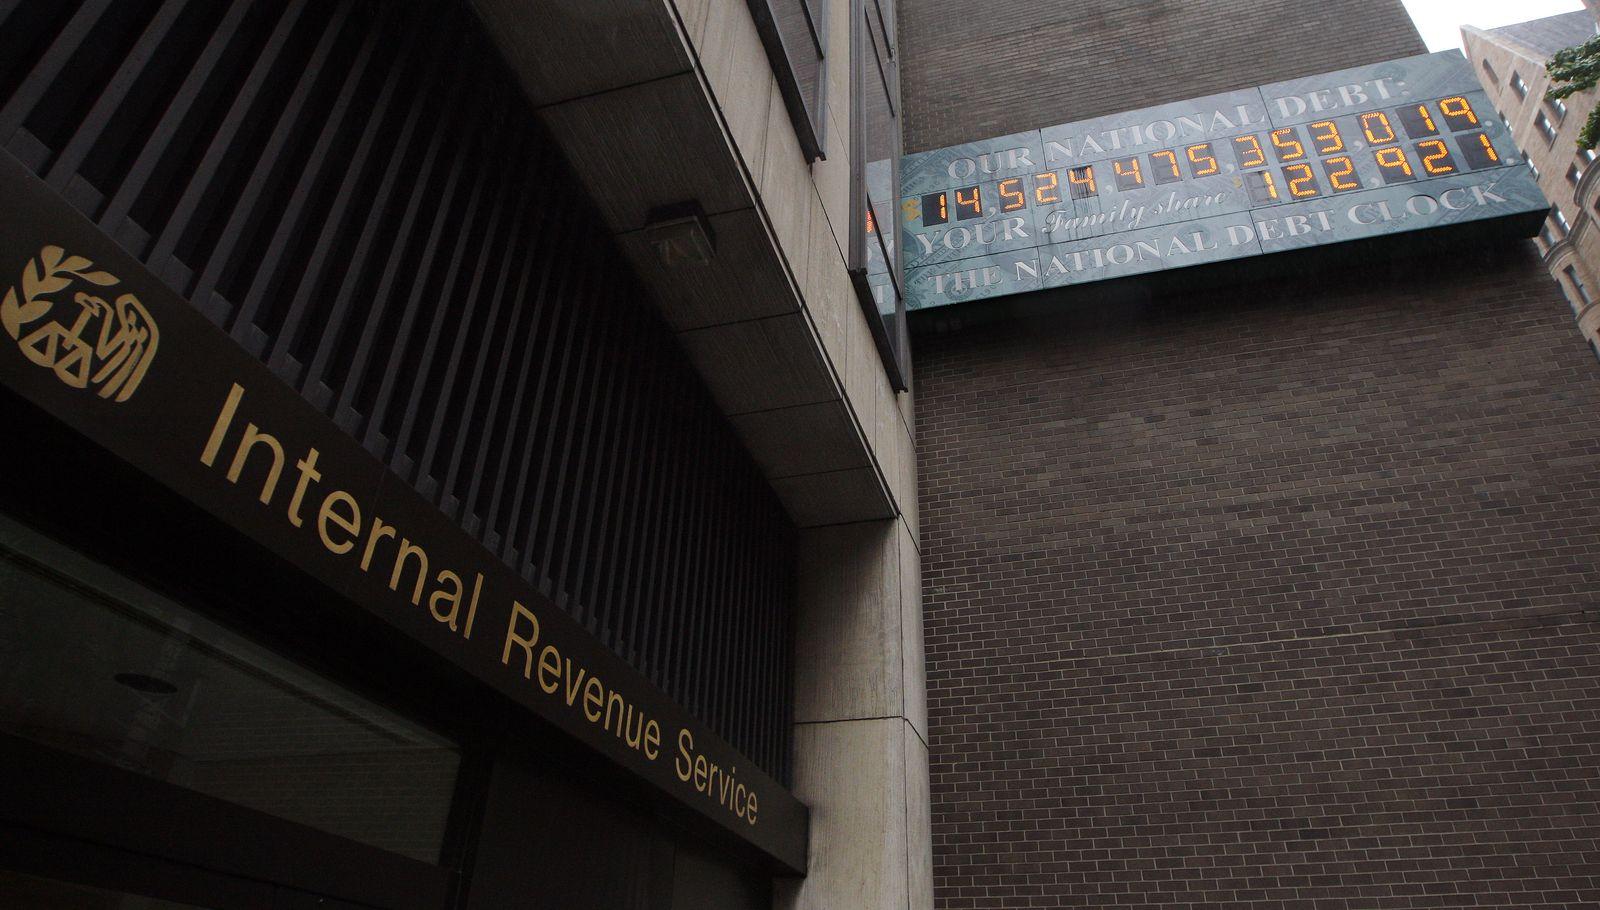 USA / IRS International Revenue Service